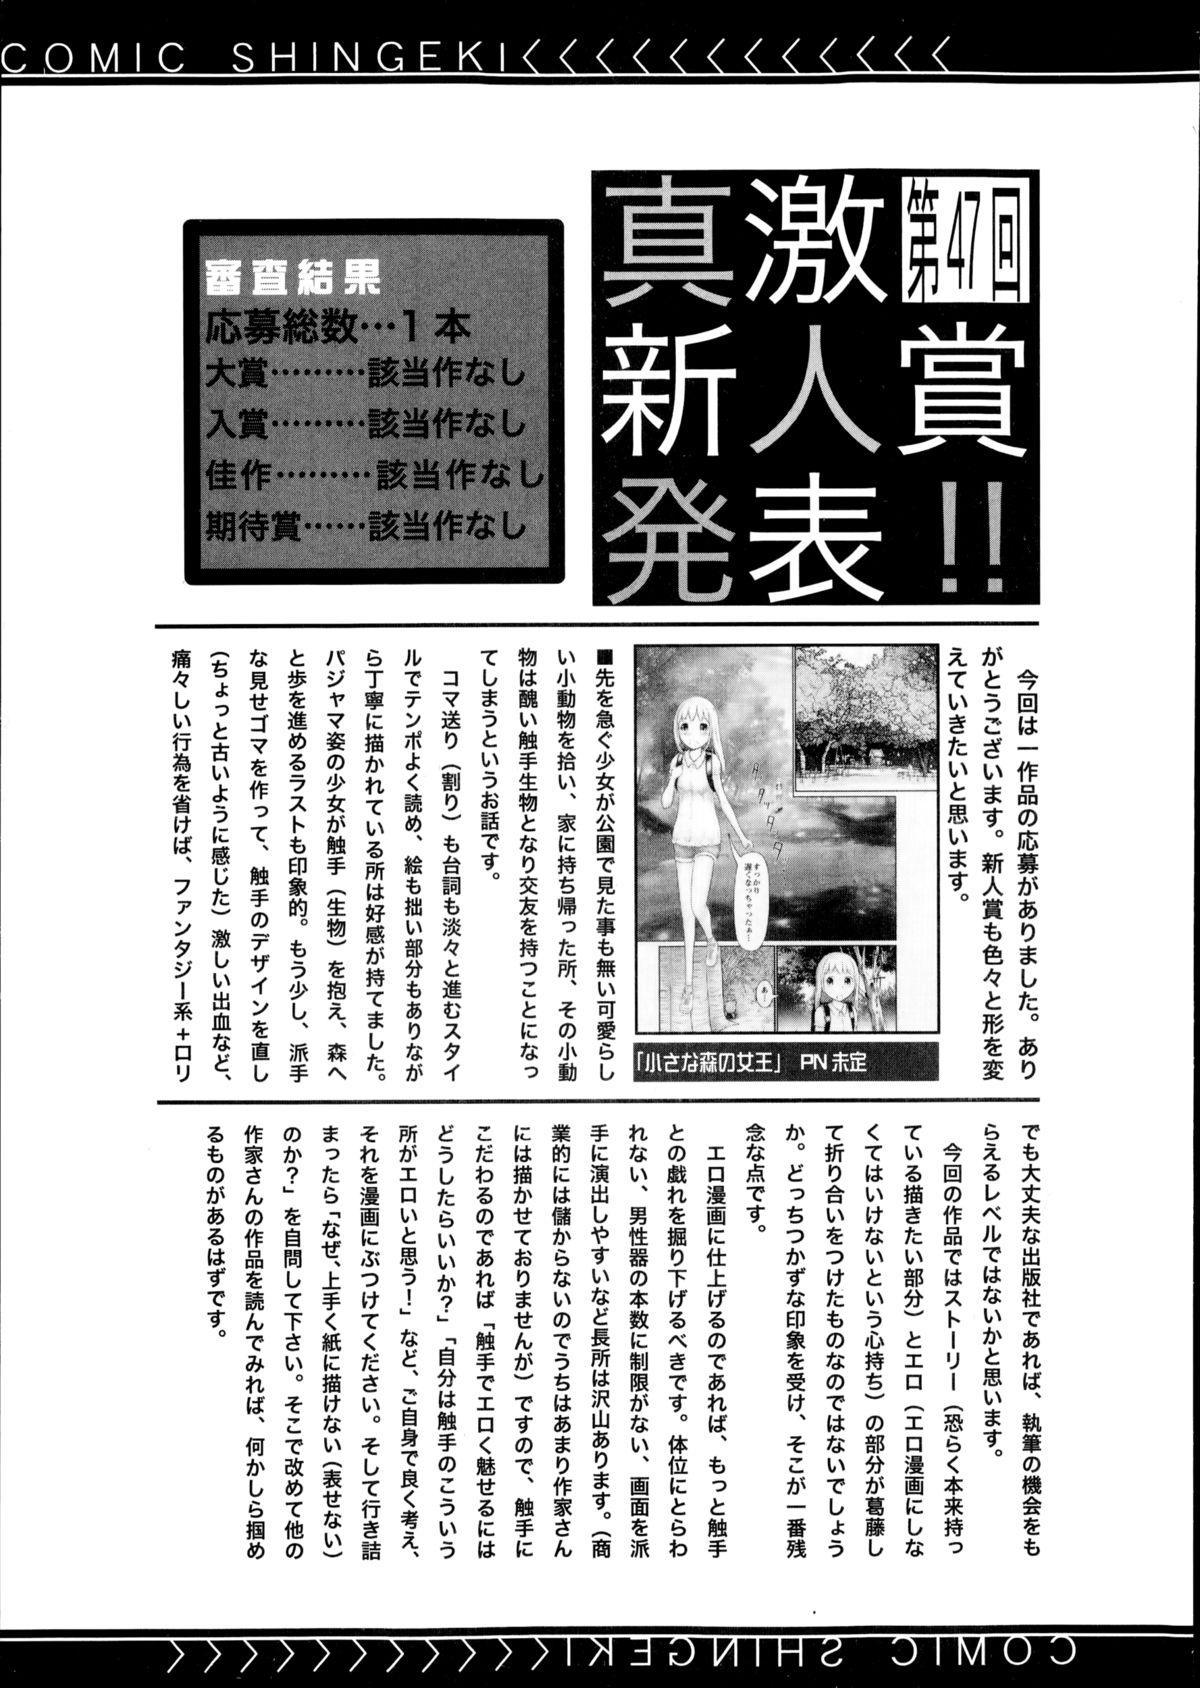 COMIC Shingeki 2014-12 344